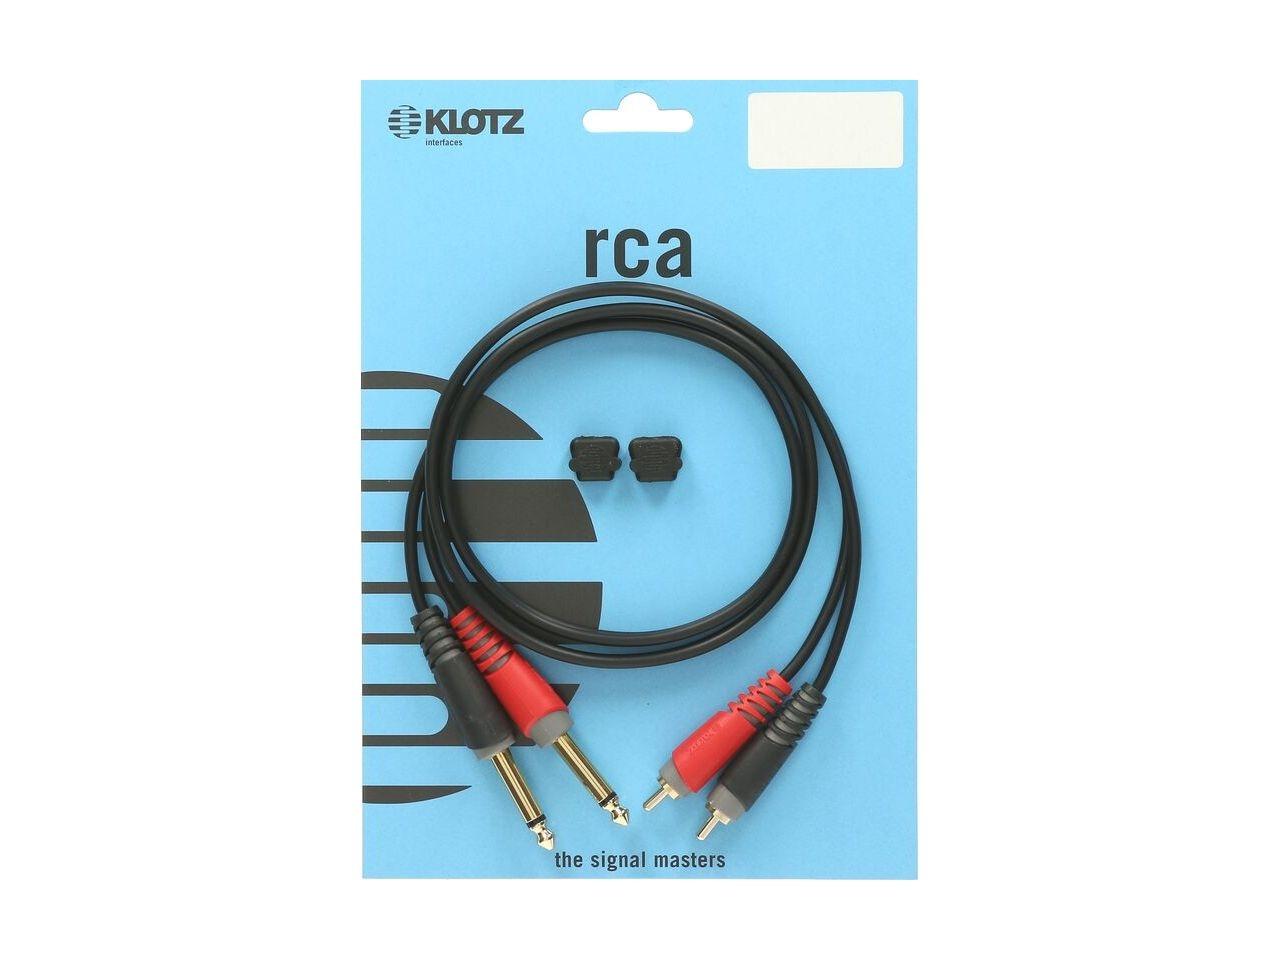 Klotz 2x Klinke 6,3 mono an 2x RCA 2m